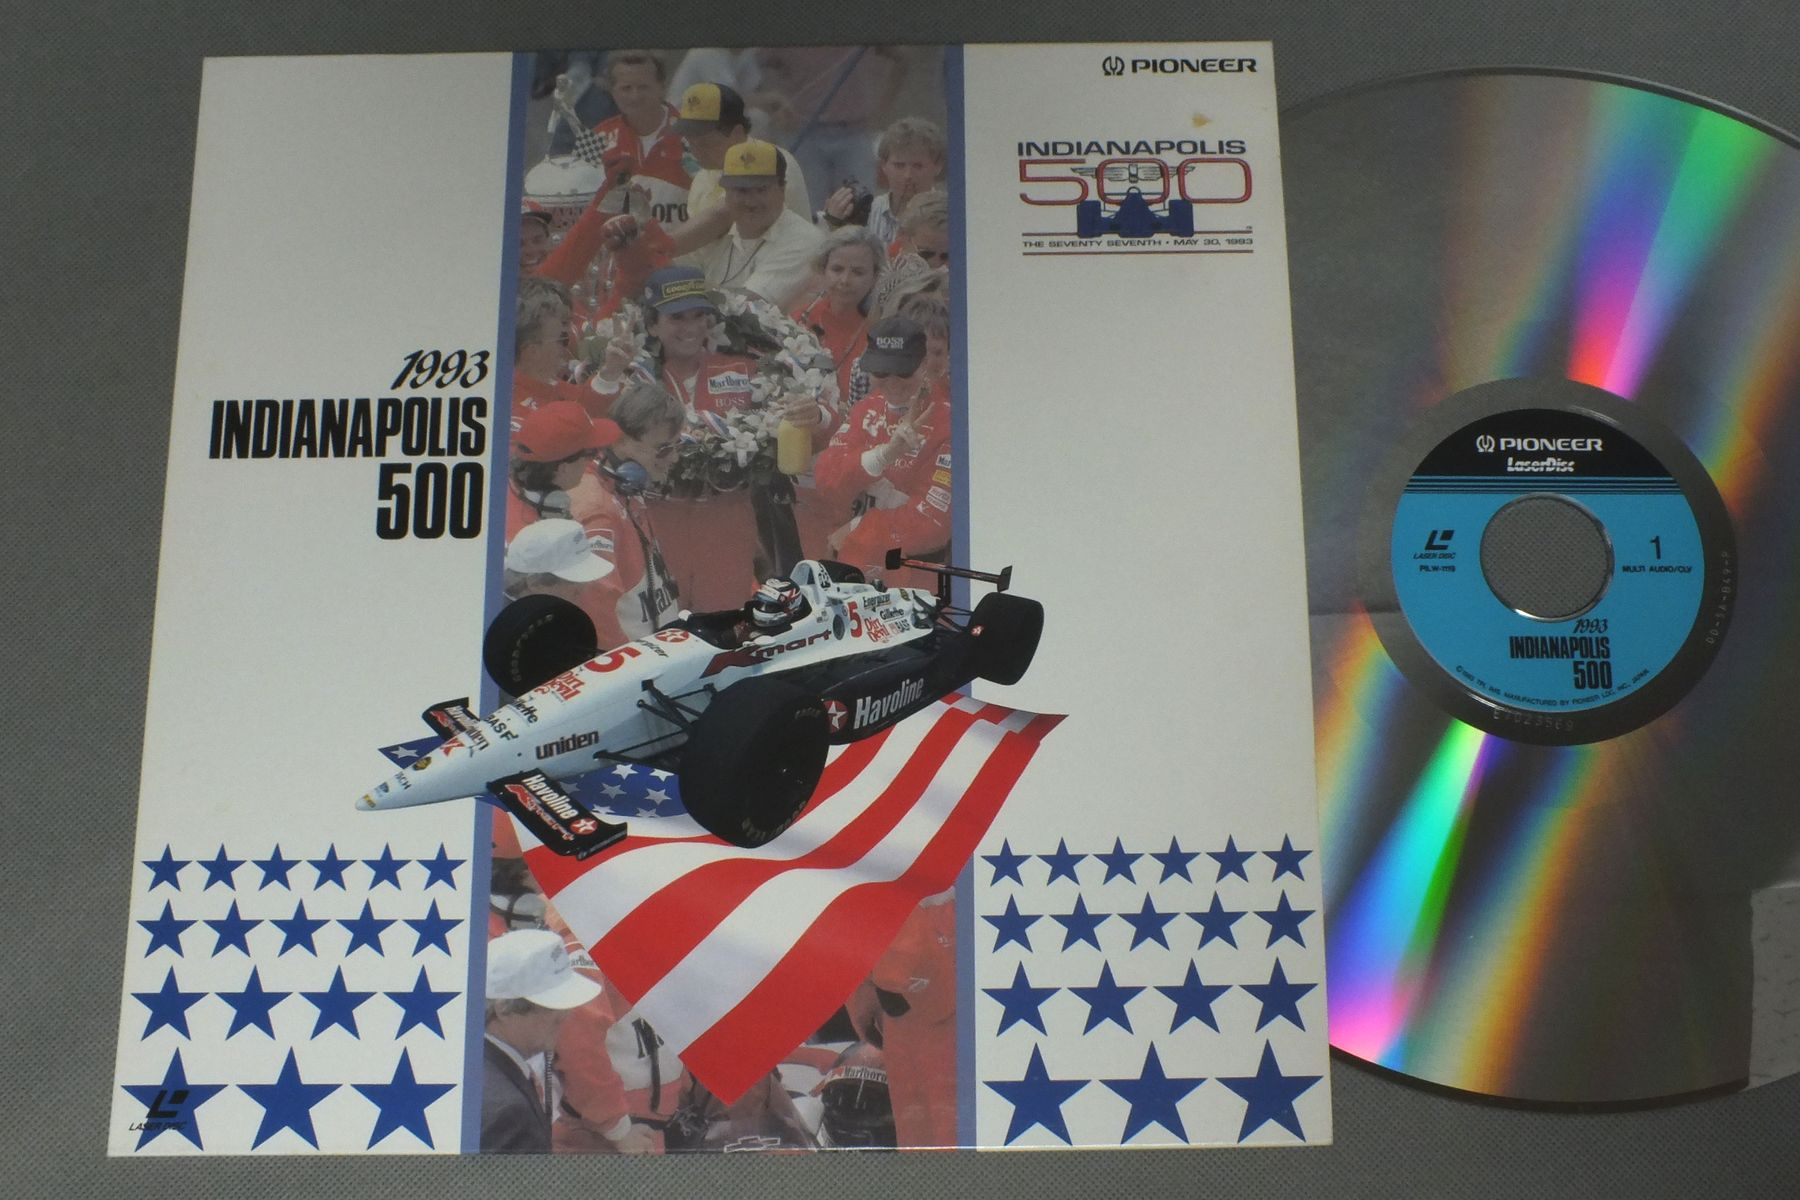 INDIANAPOLIS 500 - 1993 - Laser Disc